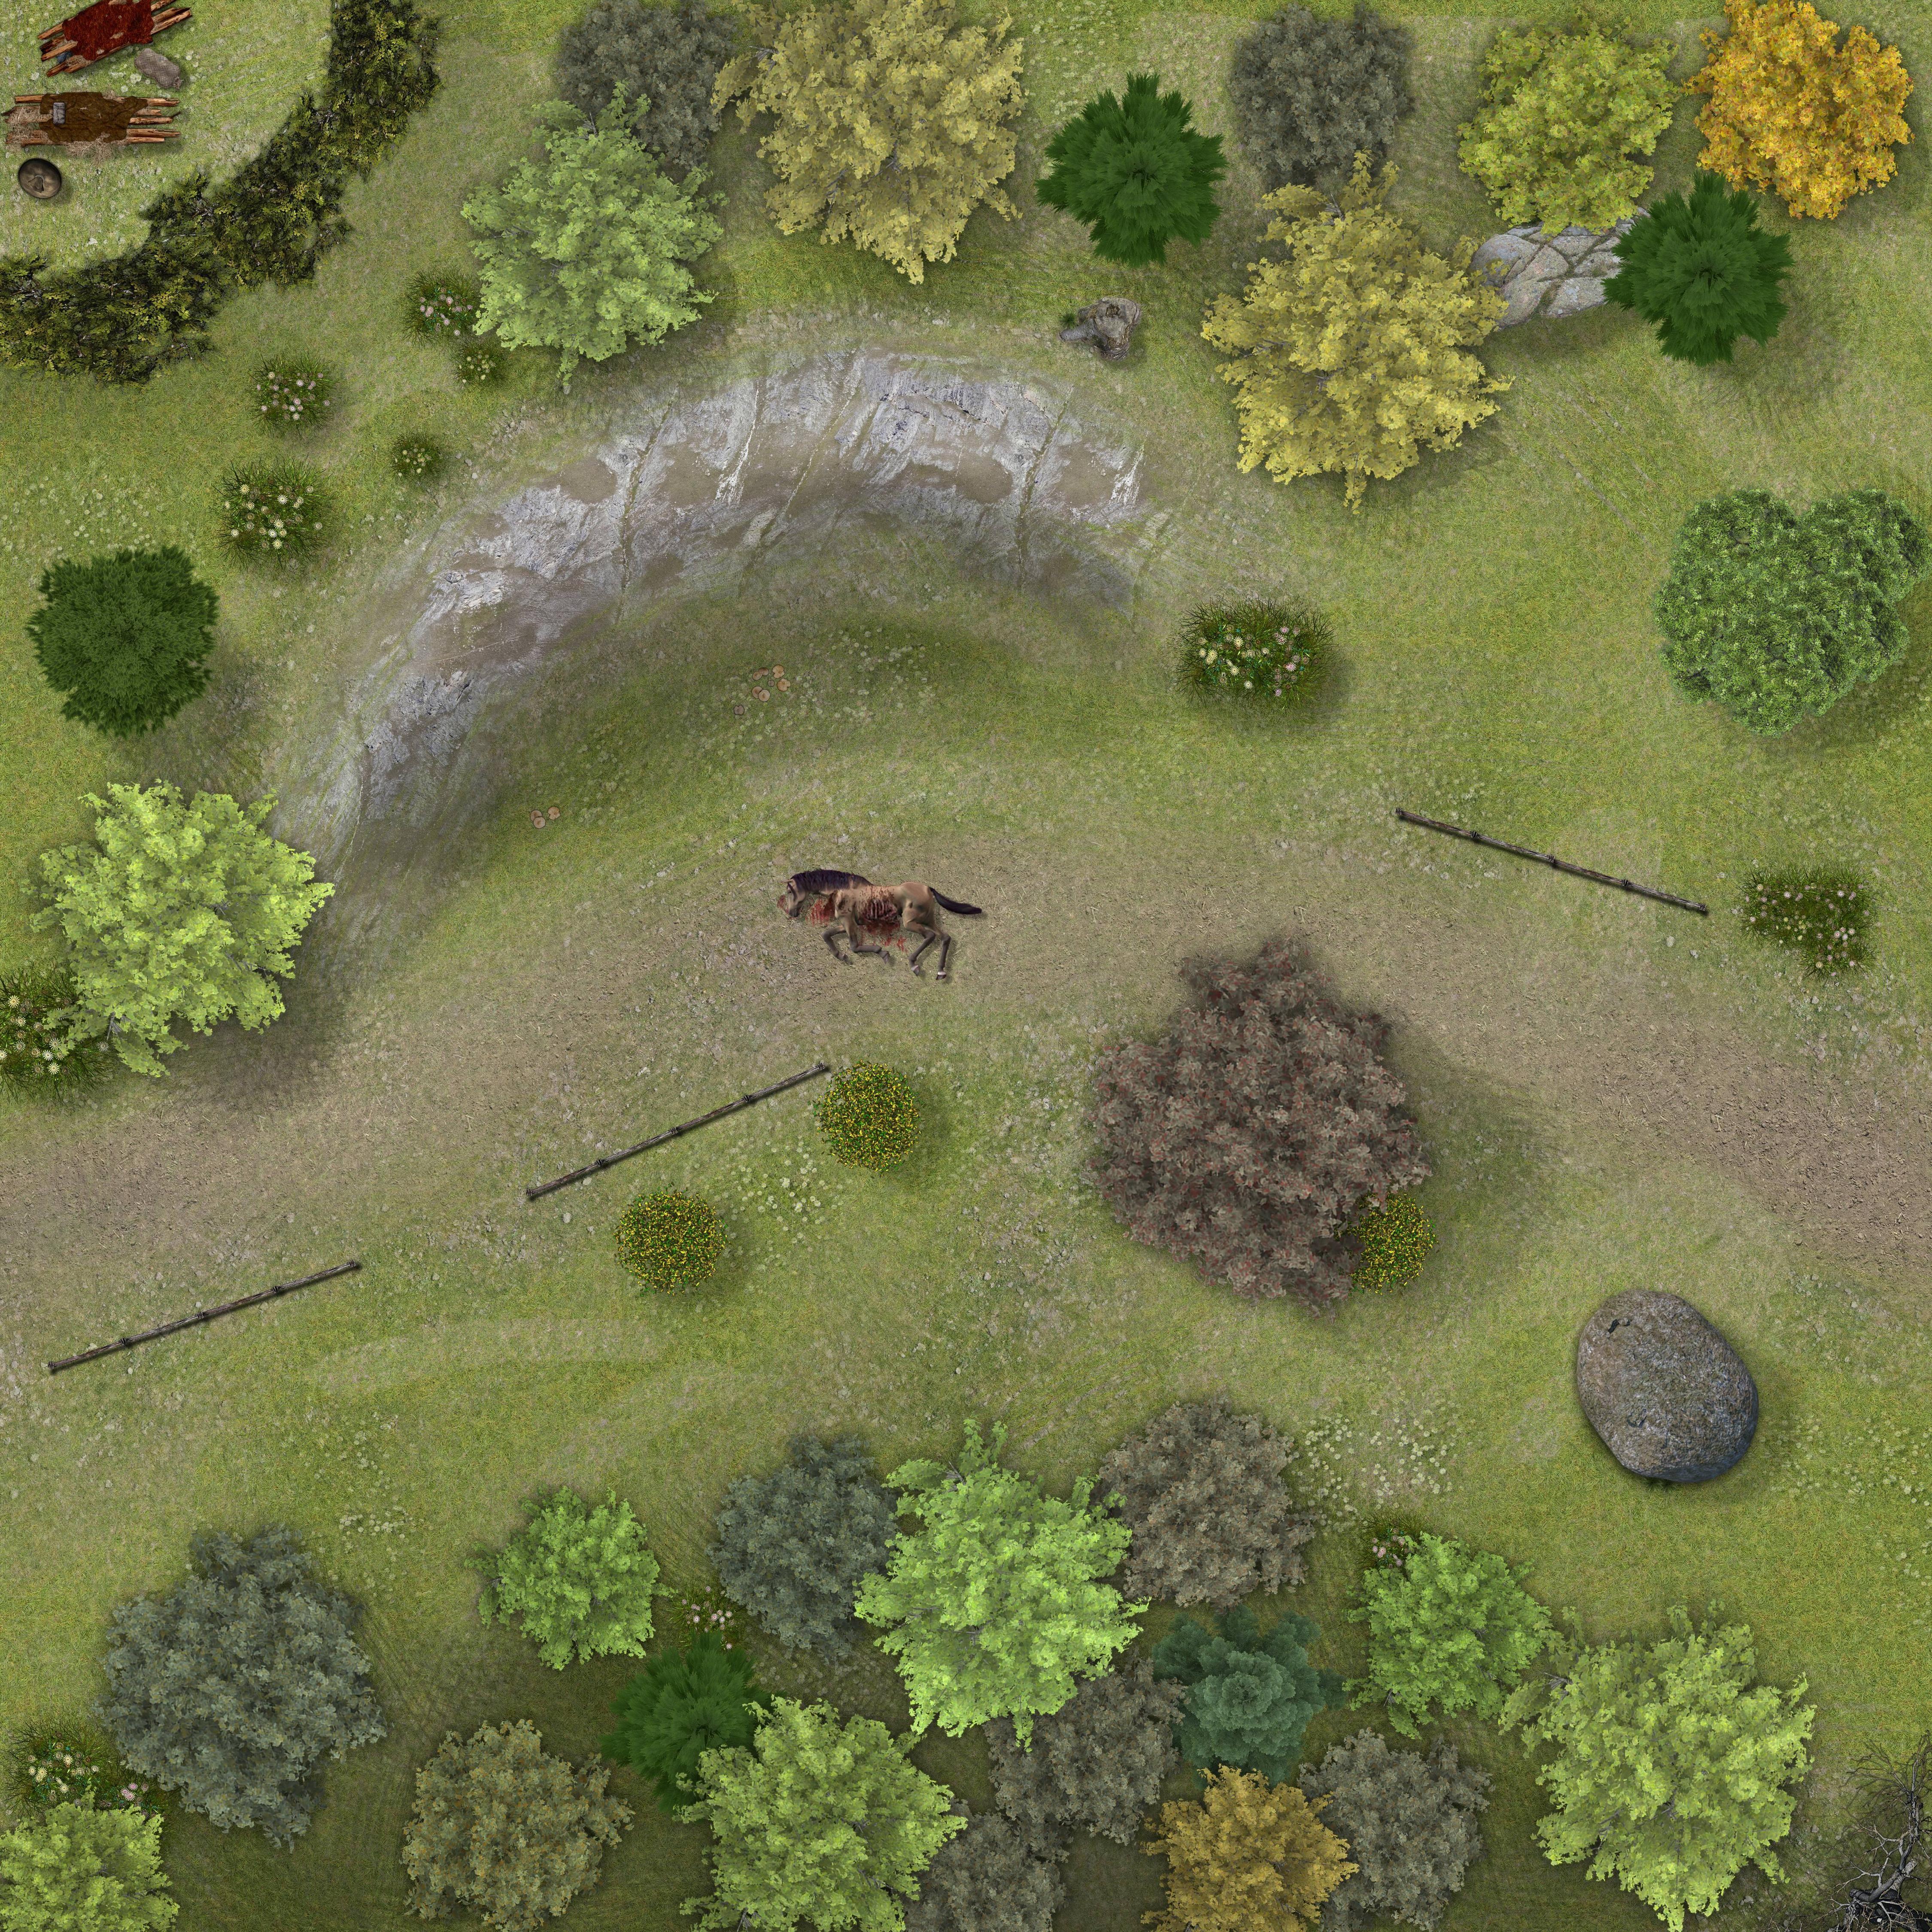 Goblin Ambush Battle map Lost mines of phandelver